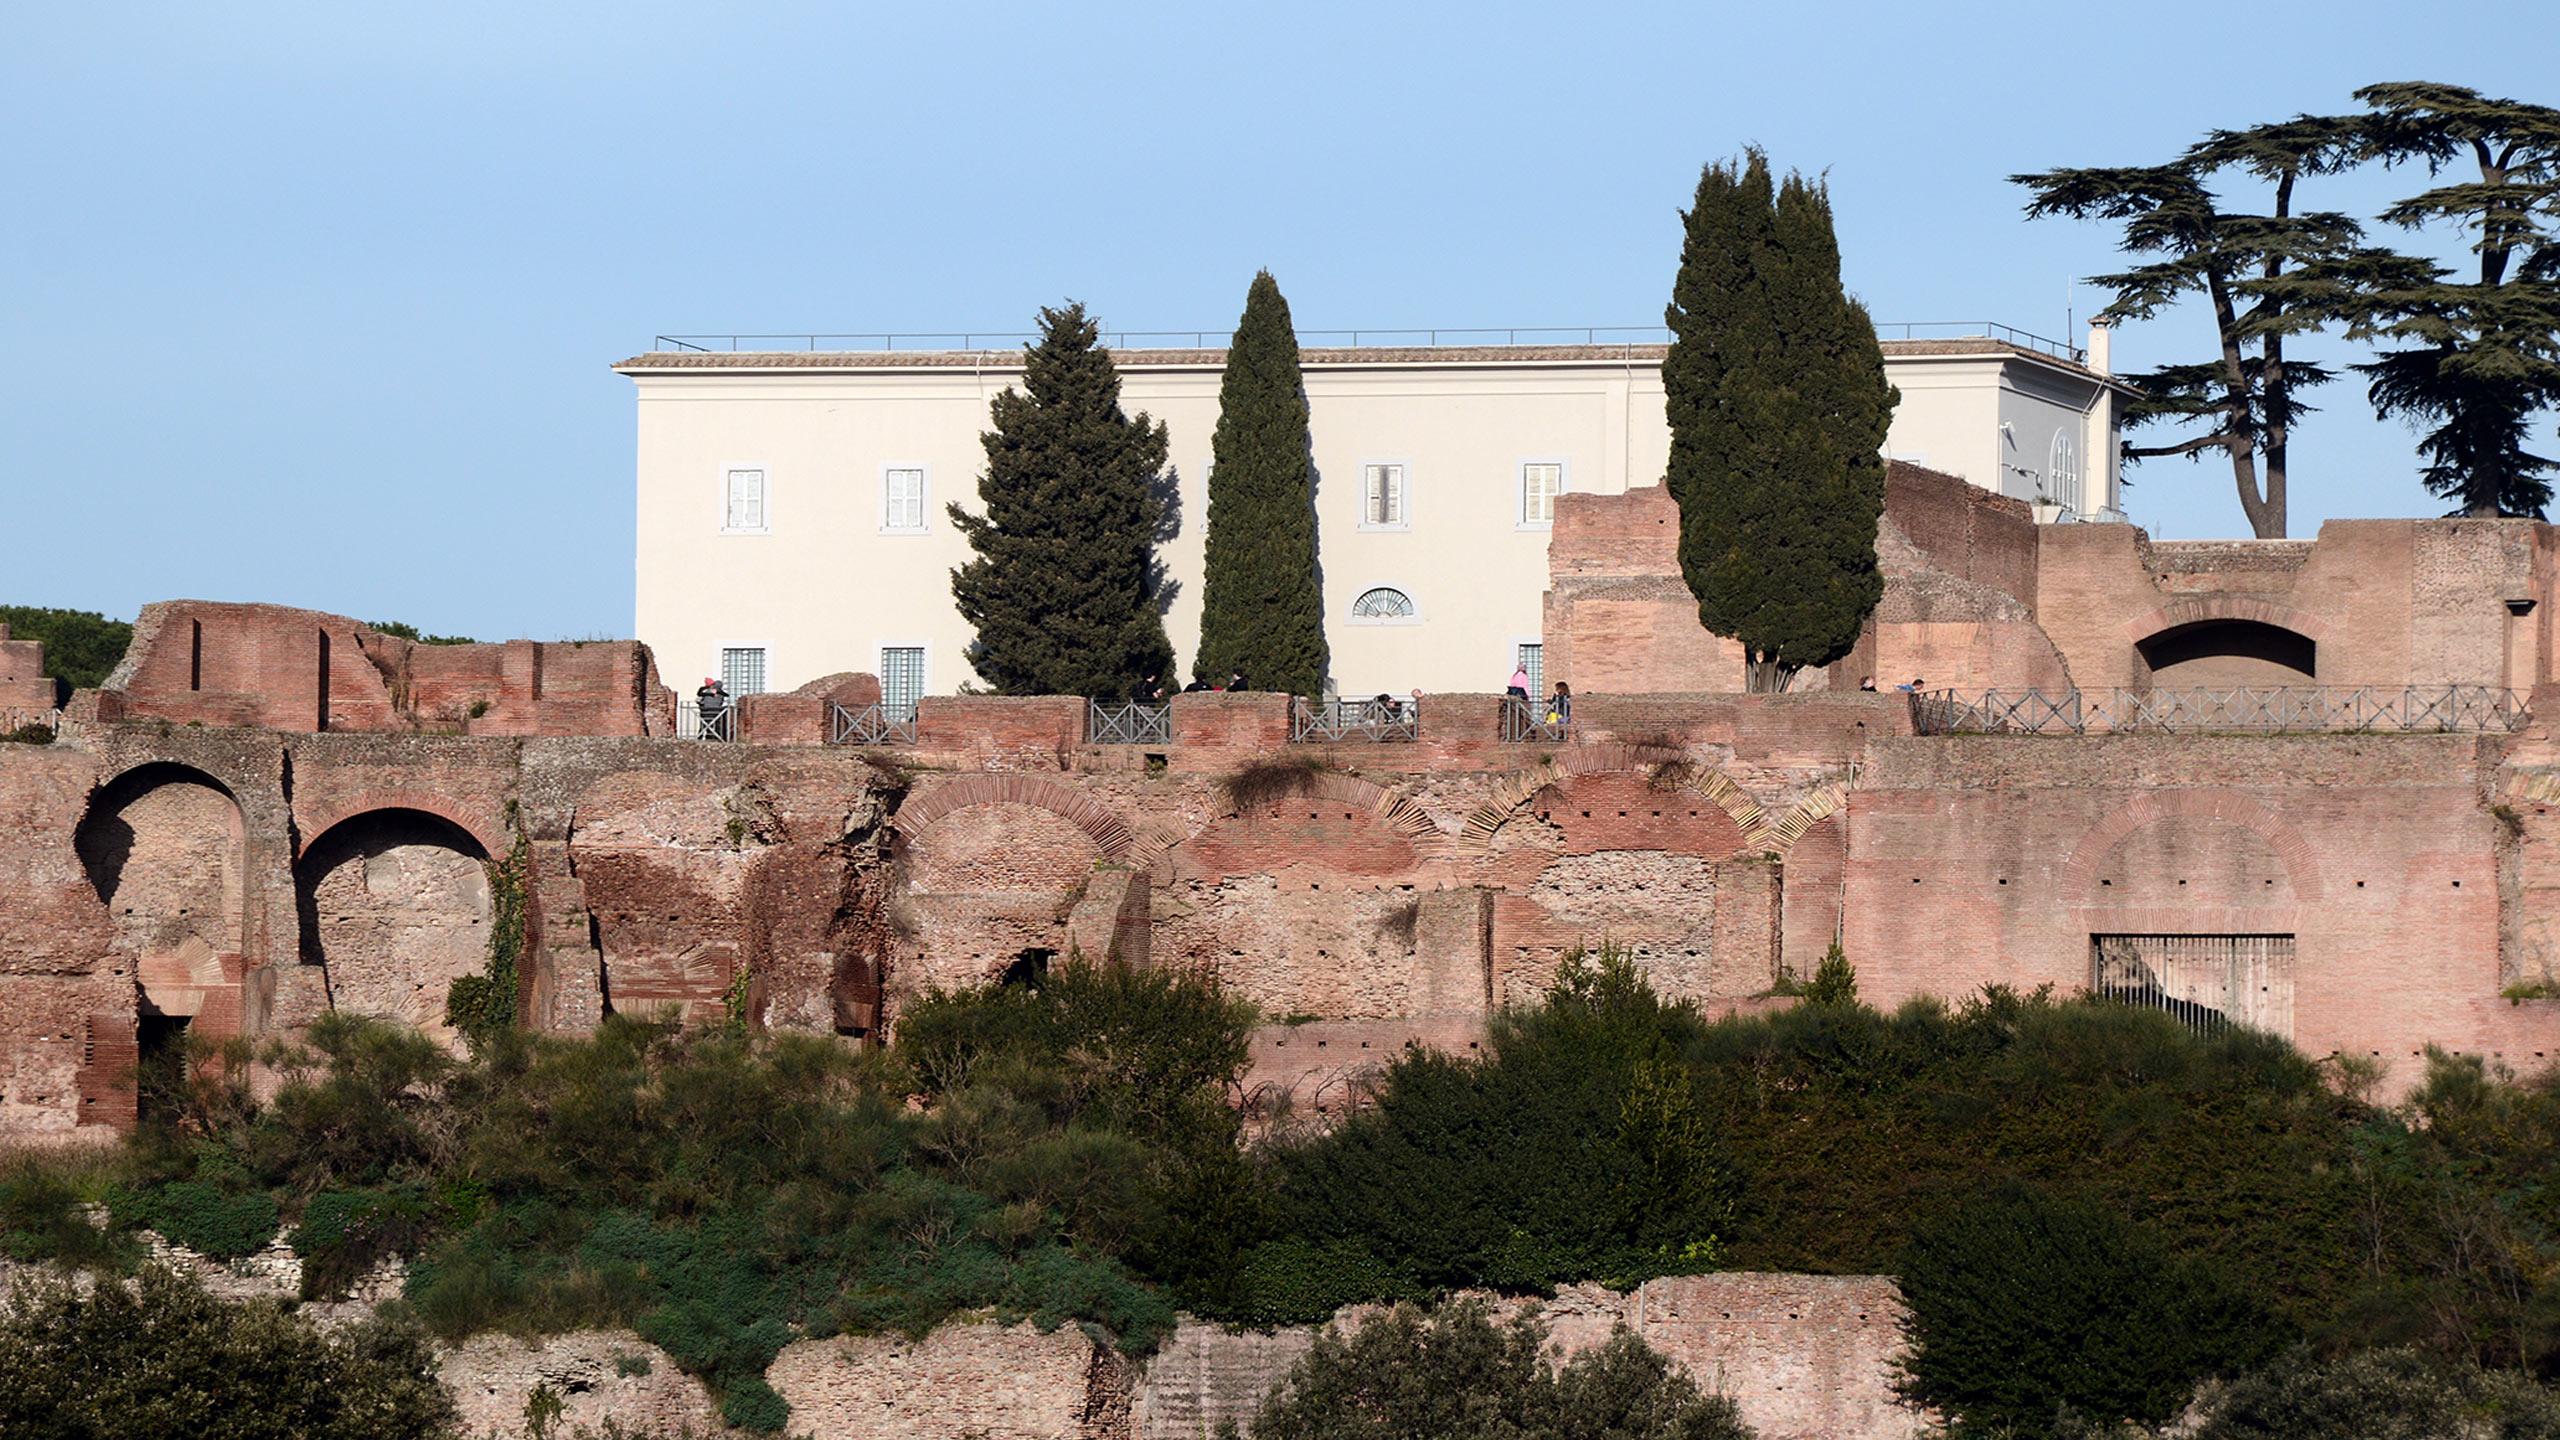 Blog-Quarta-Hospitality-in-Rome-Hotel-Regno-Roma